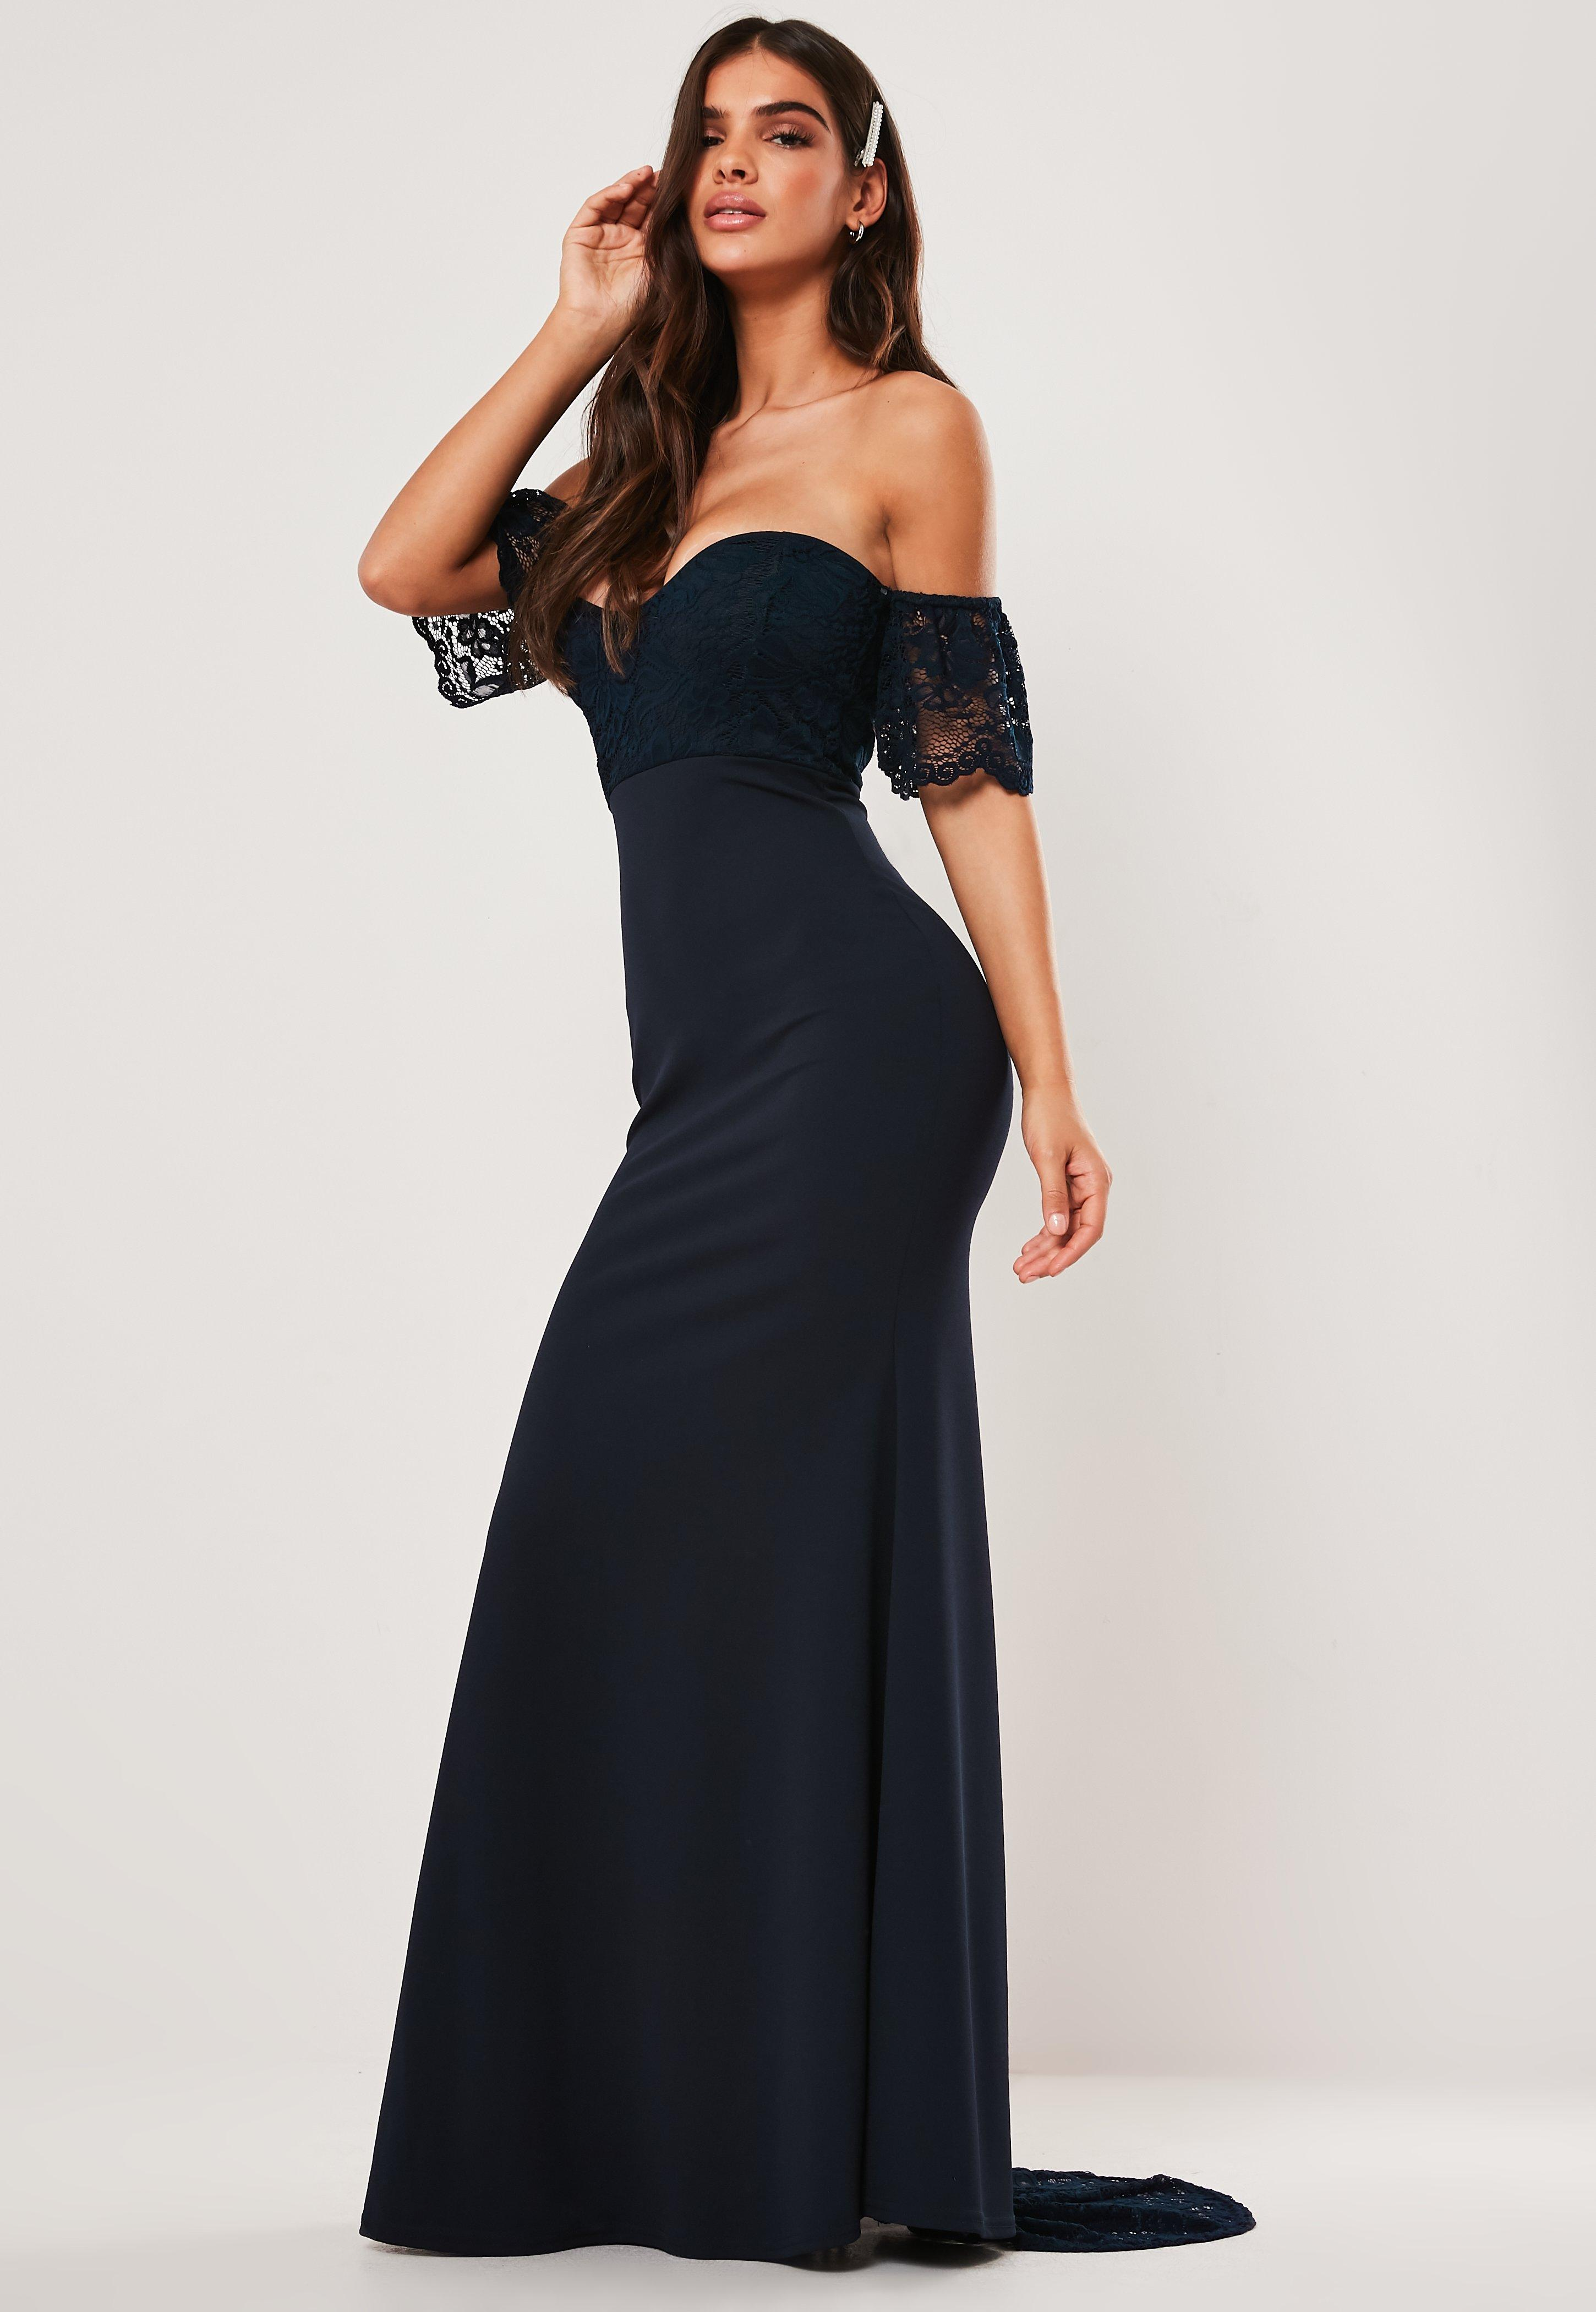 d6cd84f4a08 Bridesmaid Navy Bardot Lace Detail Fishtail Maxi Dress